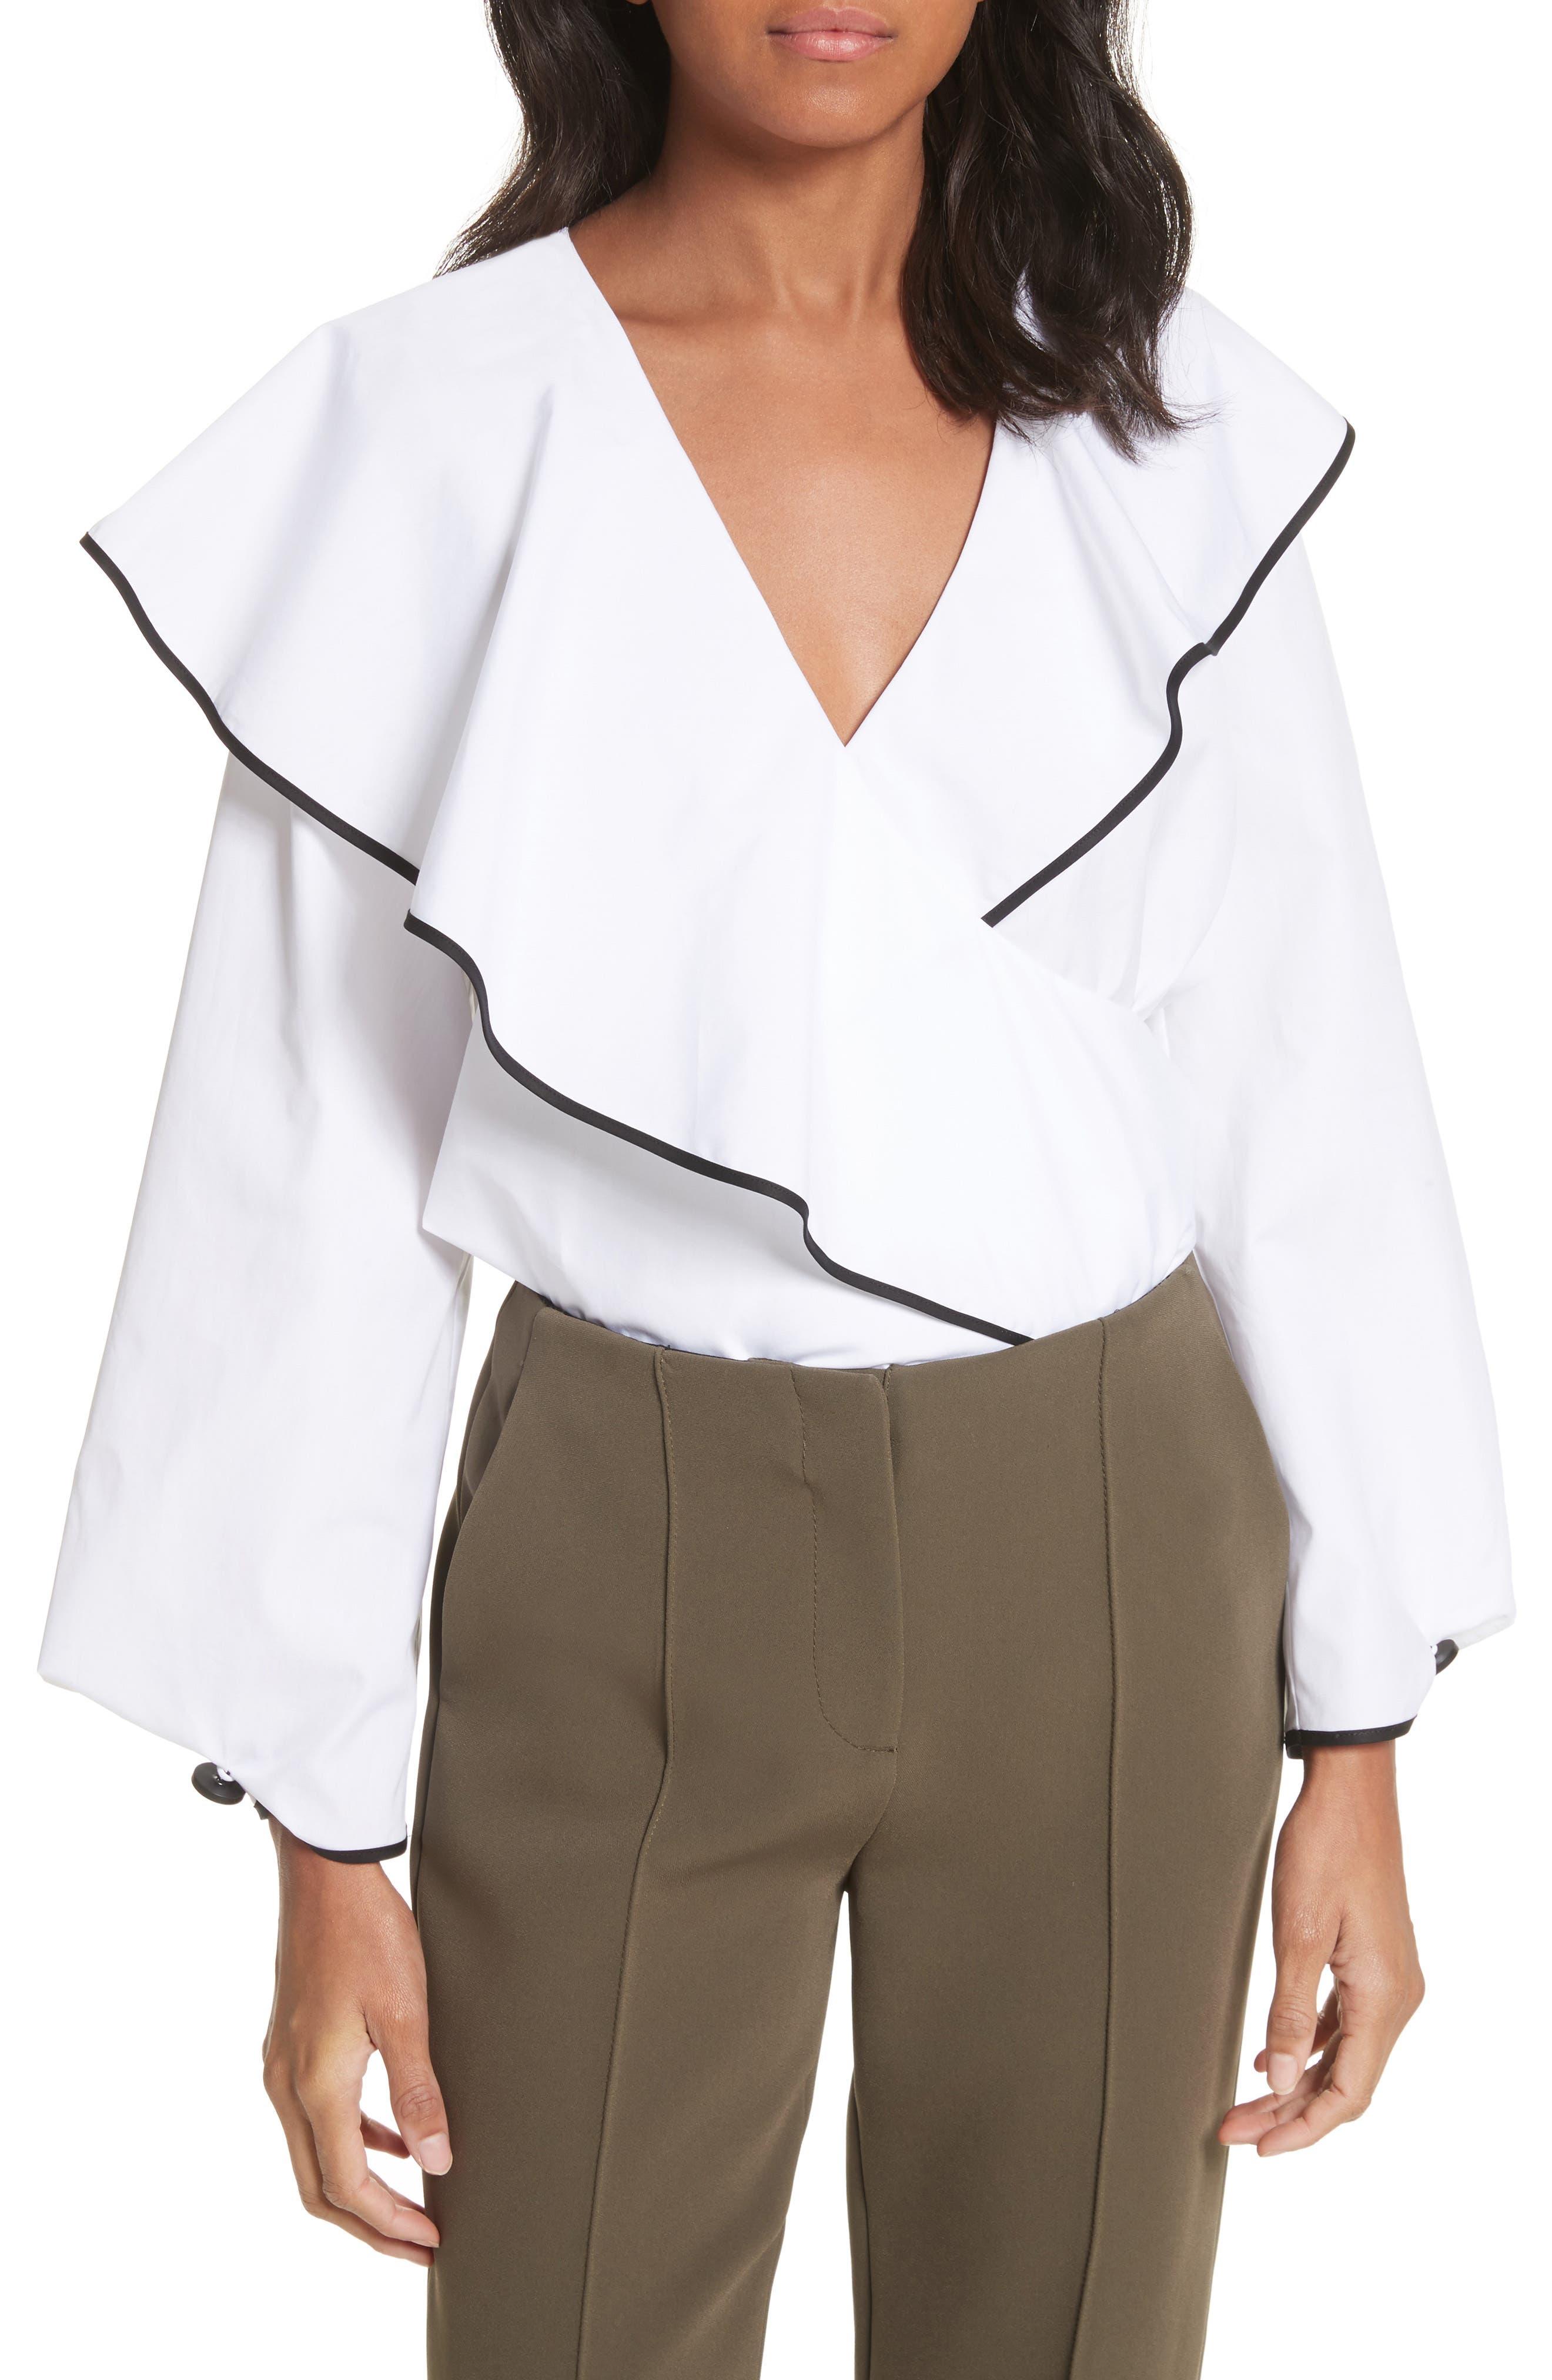 Diane von Furstenberg Piped Ruffled Poplin Blouse,                         Main,                         color, White